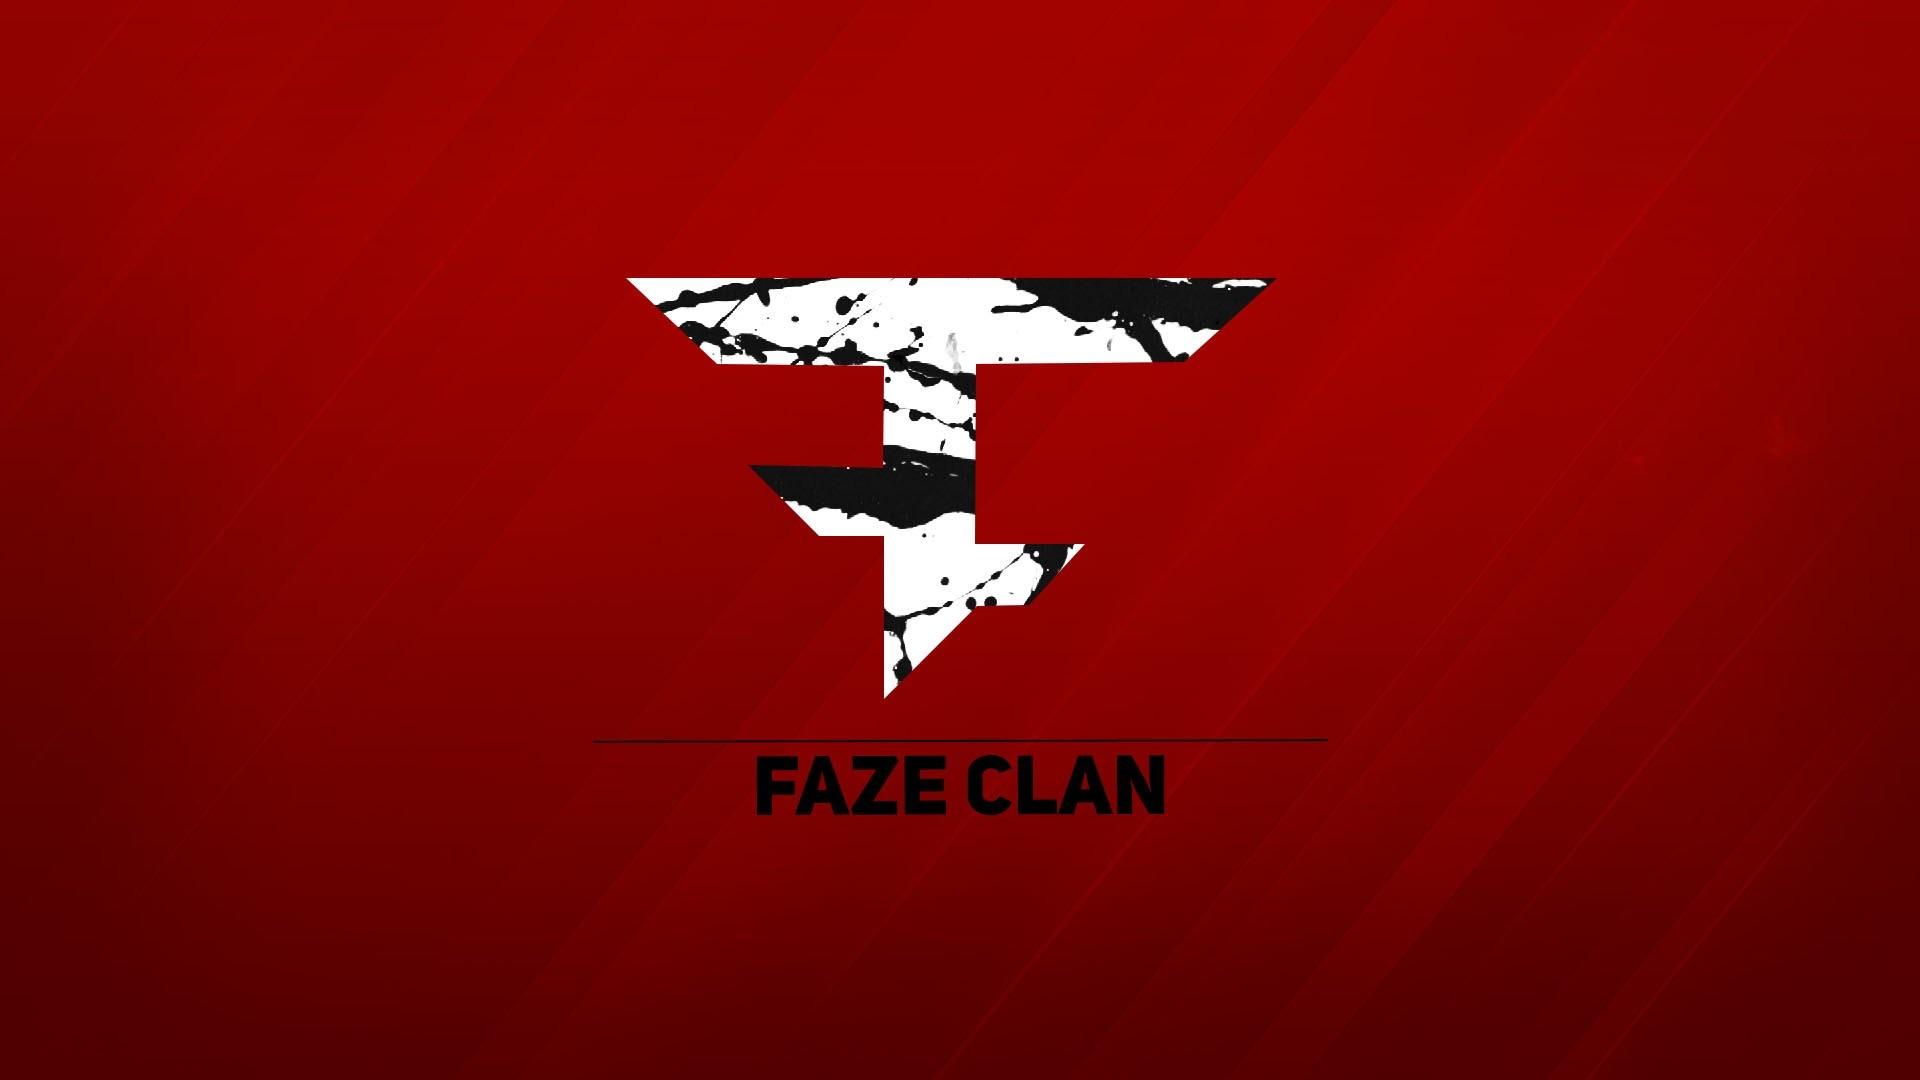 Faze Clan Logo 3d Faze Clan Competitive Perfect Faze Logo .